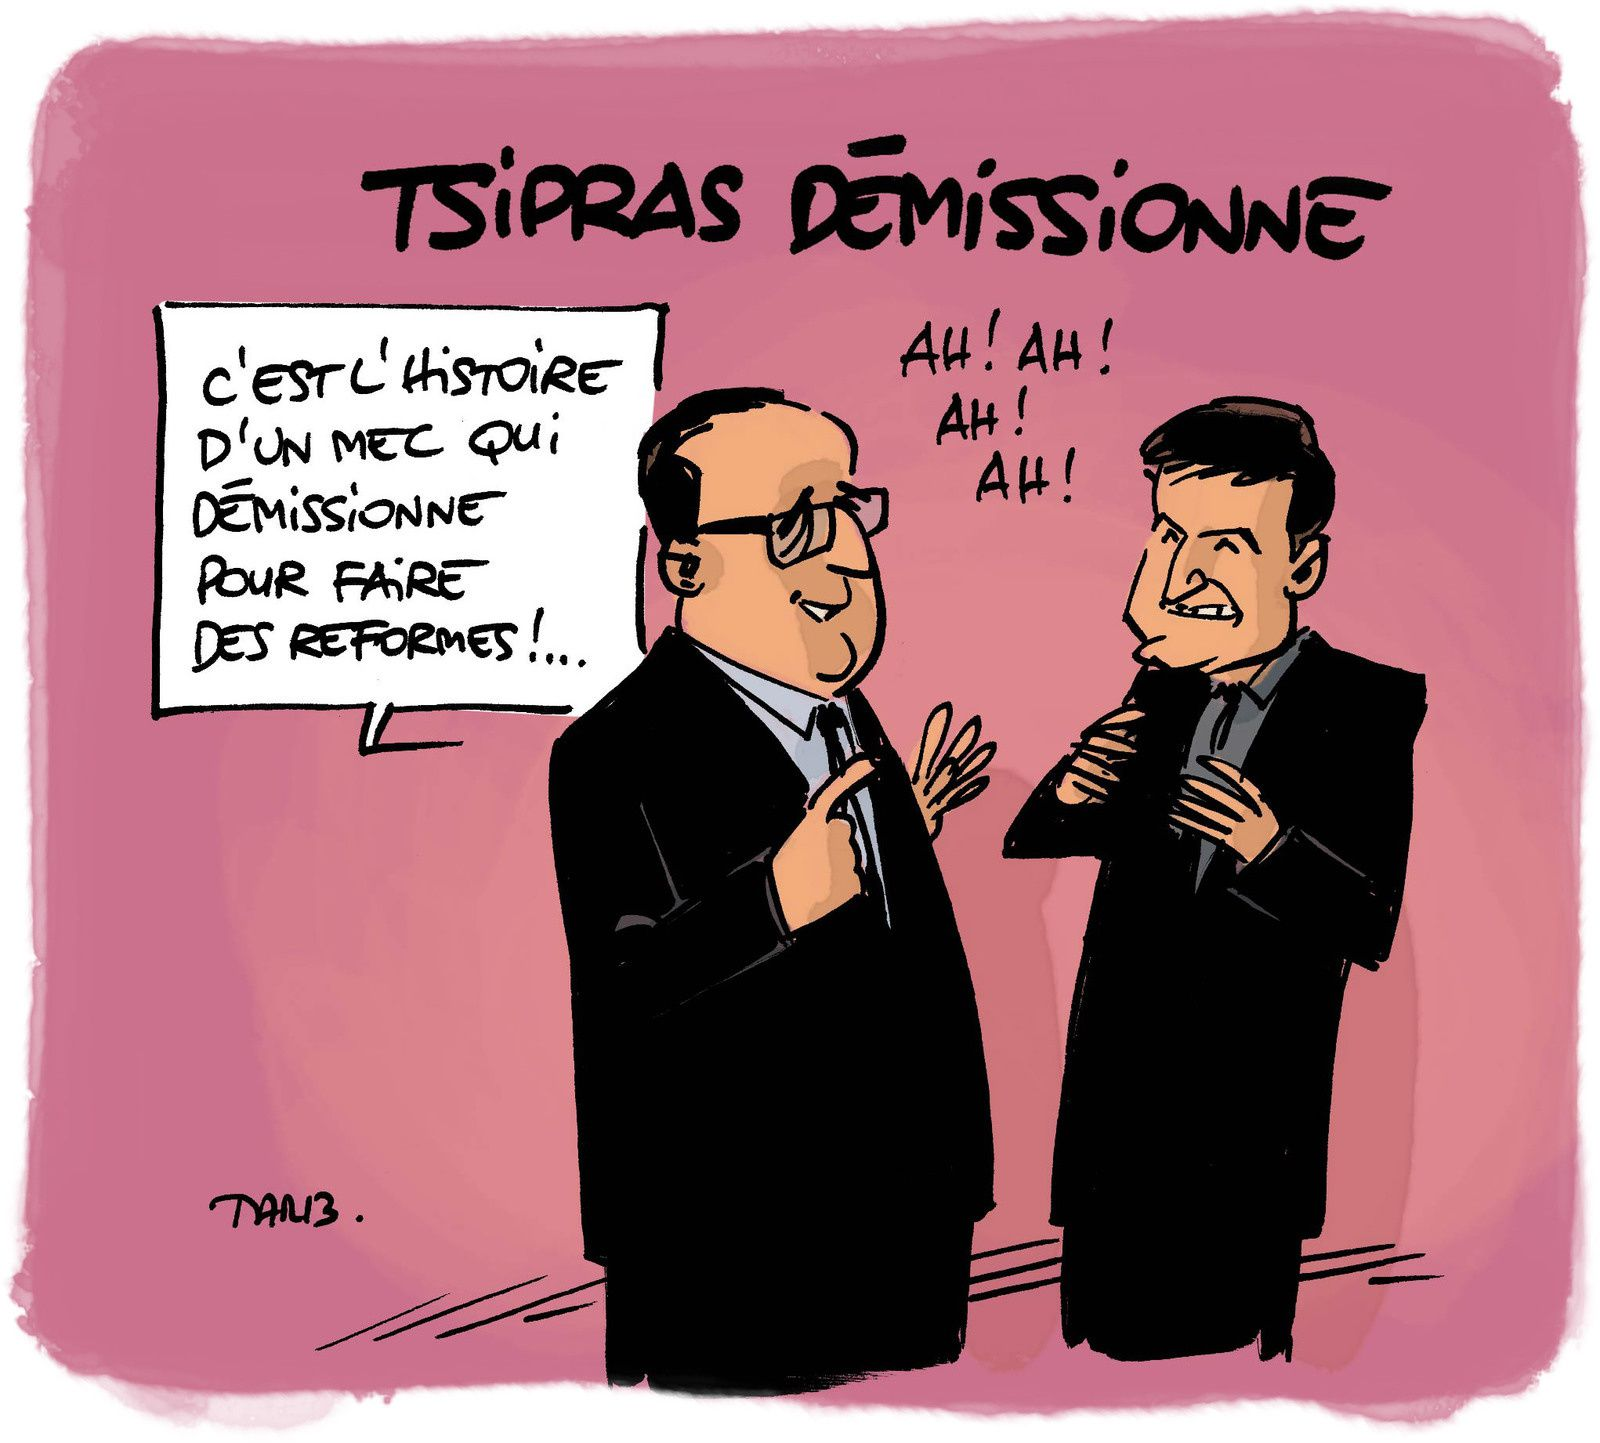 Tsipras démissionne